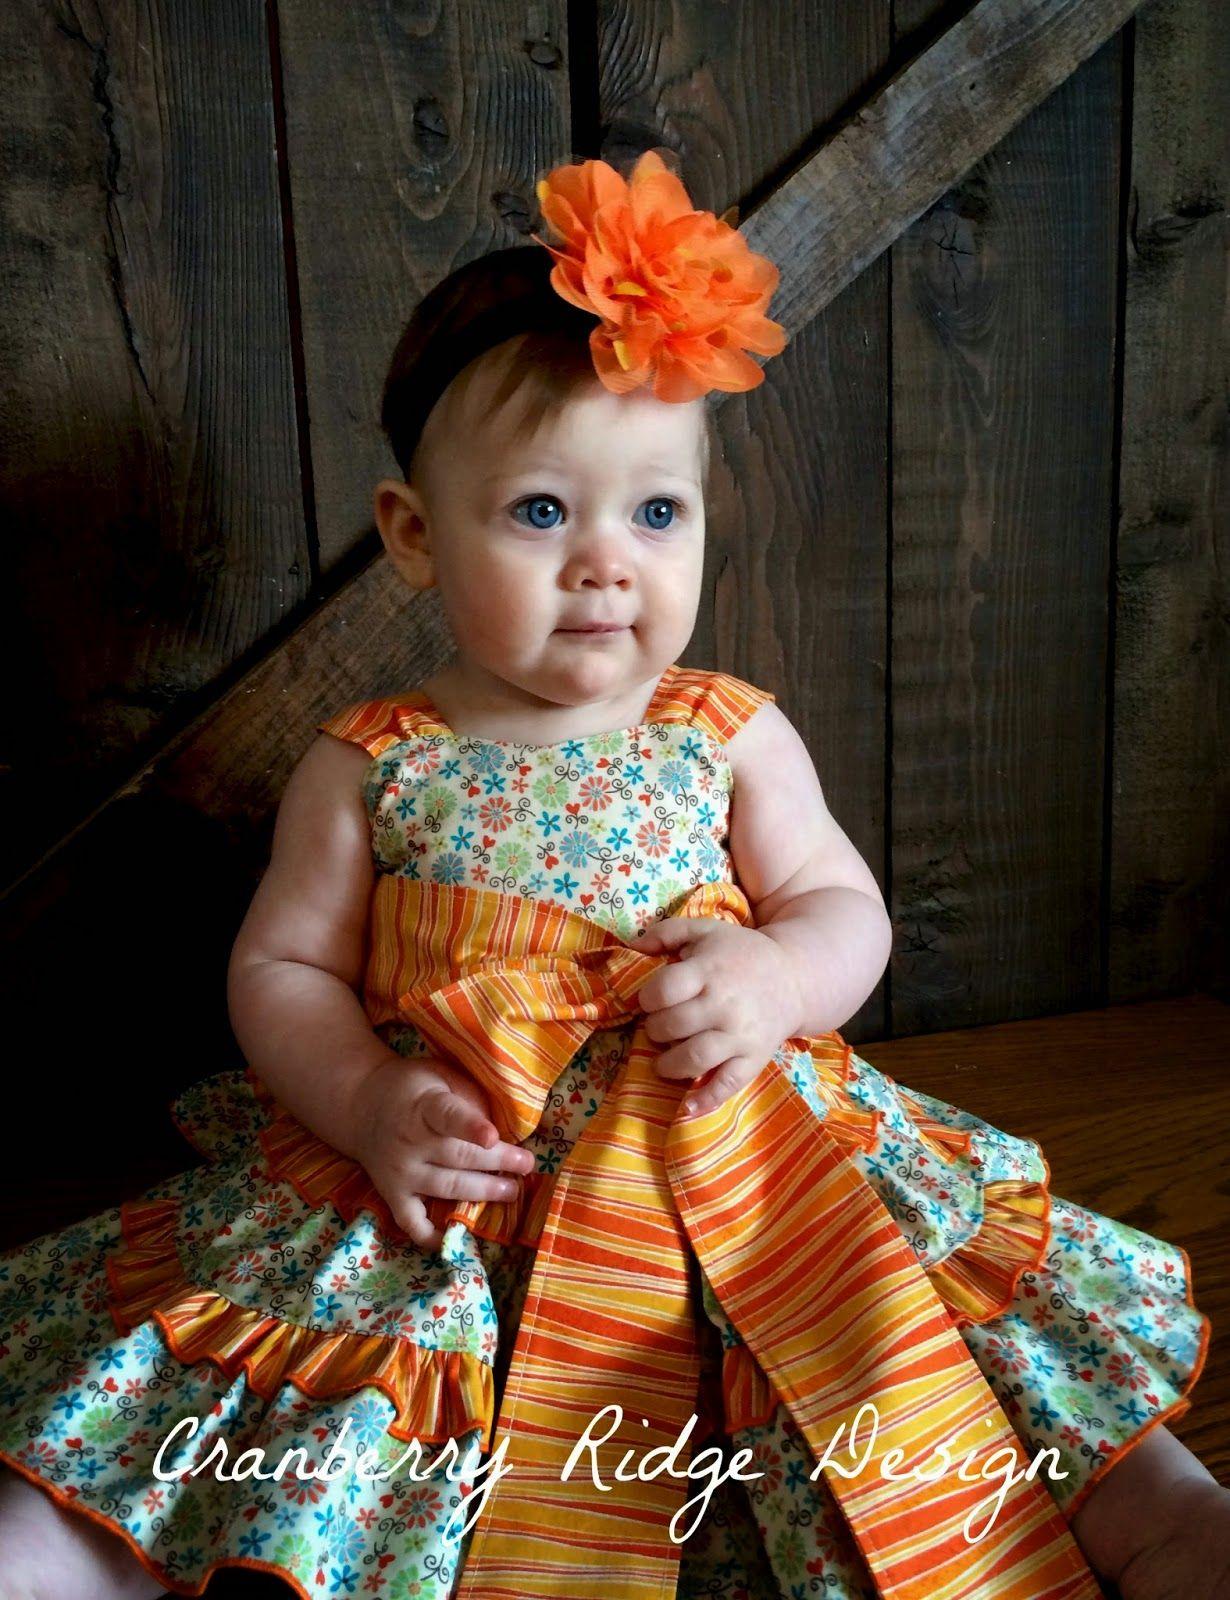 Cranberry Ridge Design: Create Kids Couture Release Mindy Pattern!